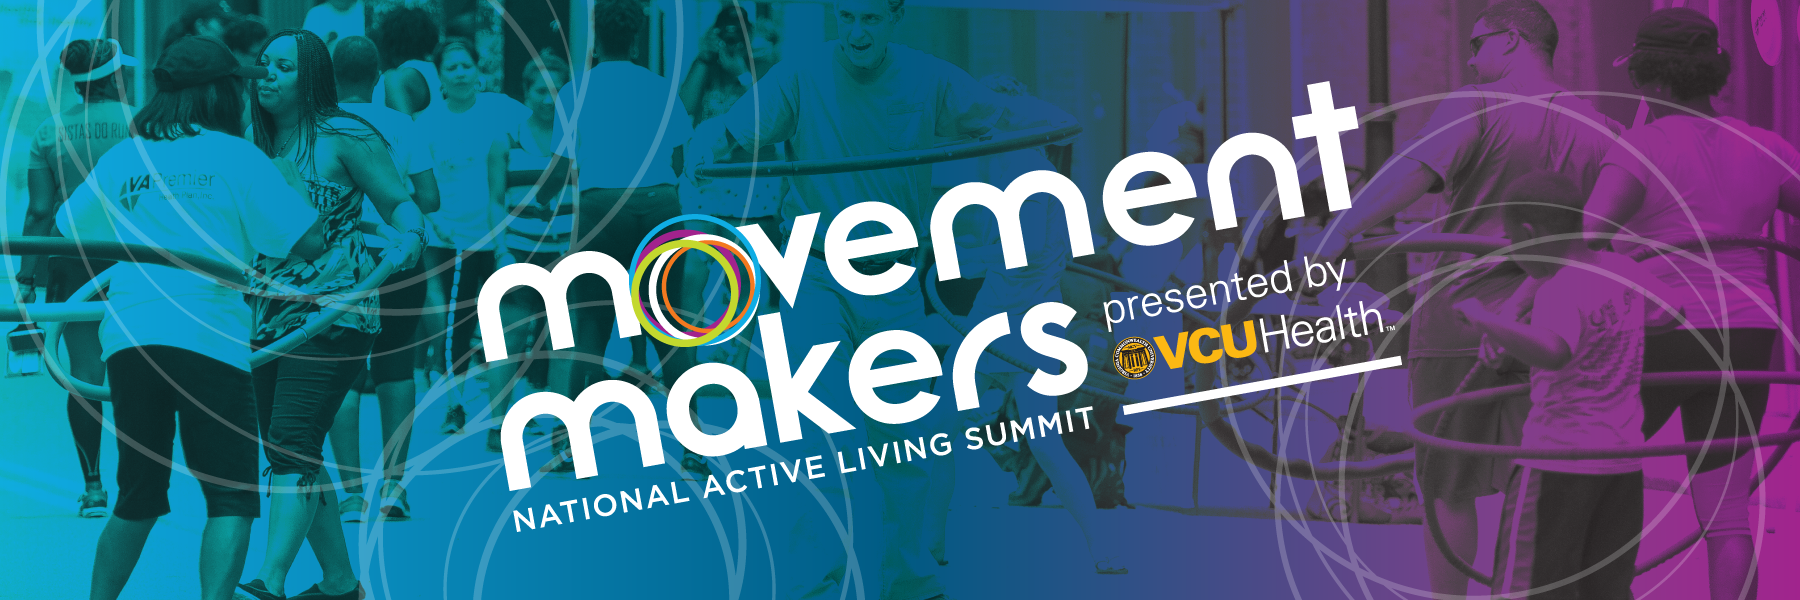 vcu health sports backers partner on movement makers summit vcu health sports backers partner on movement makers summit sports backers